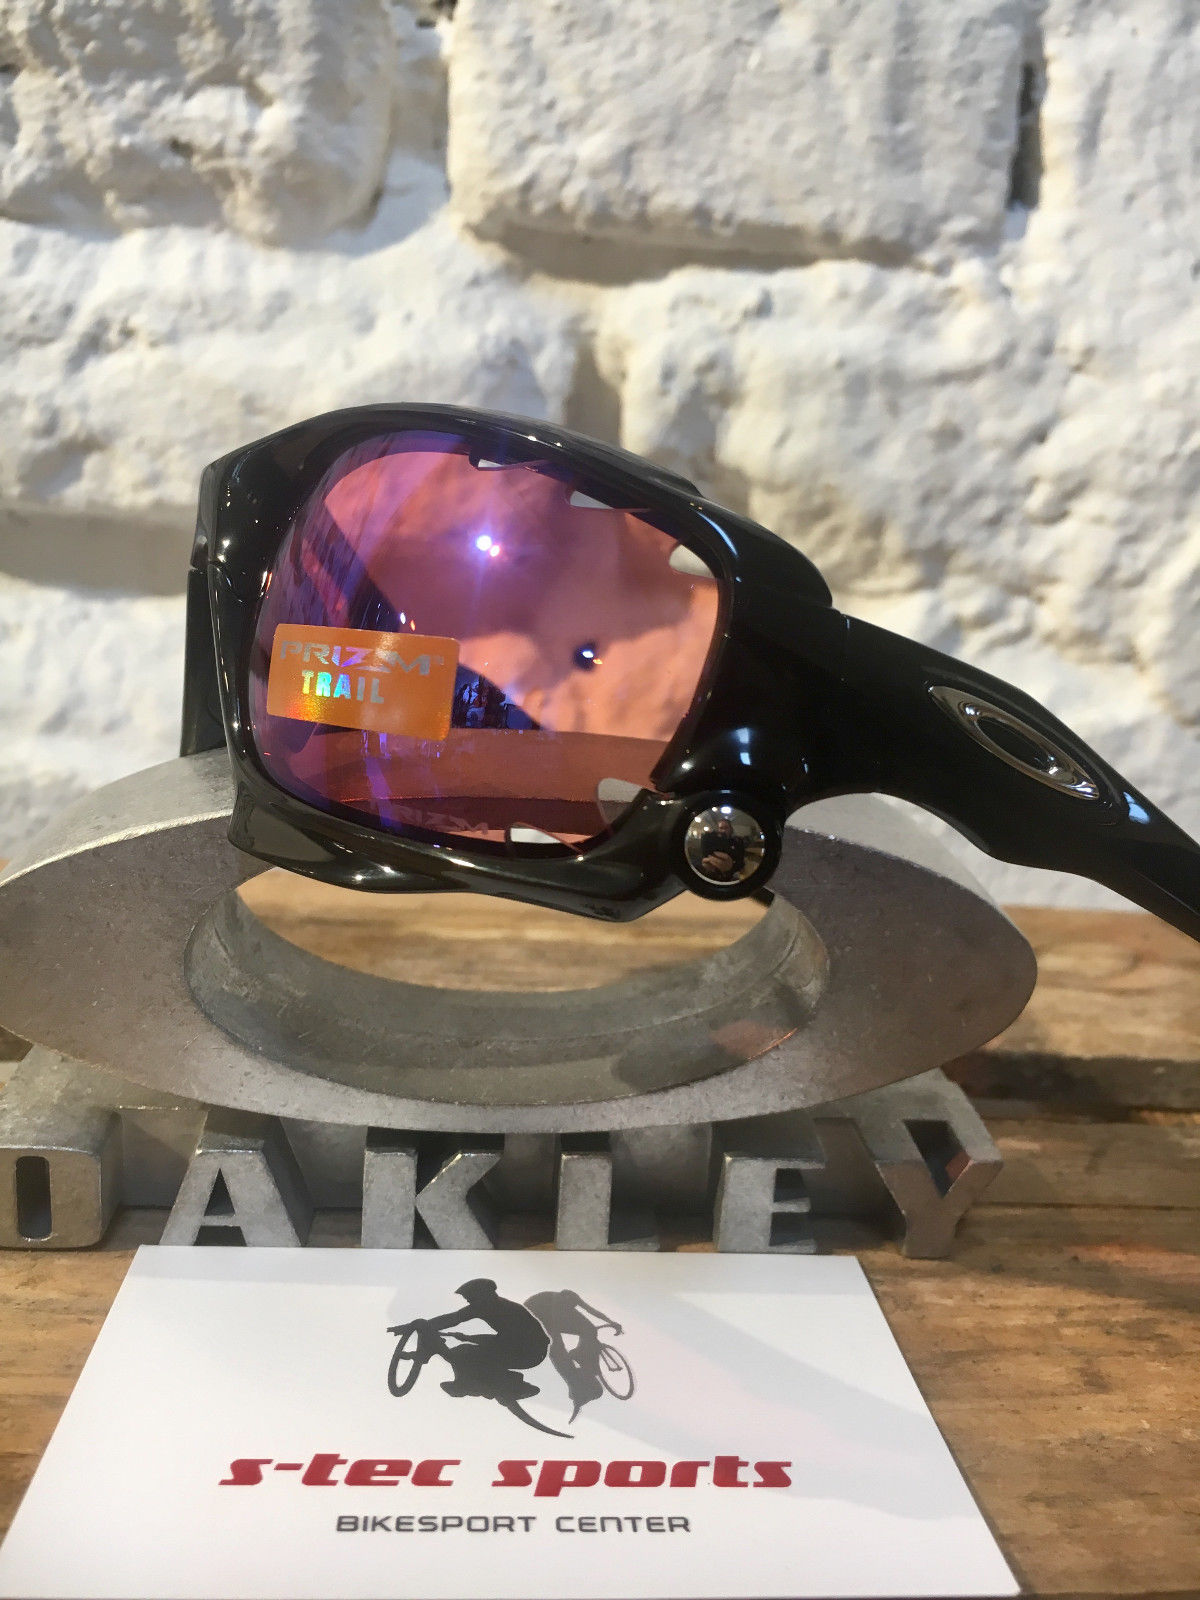 OAKLEY RACING JACKET PRIZM TRAIL polished black schwarz-clear Glas Brille 917133